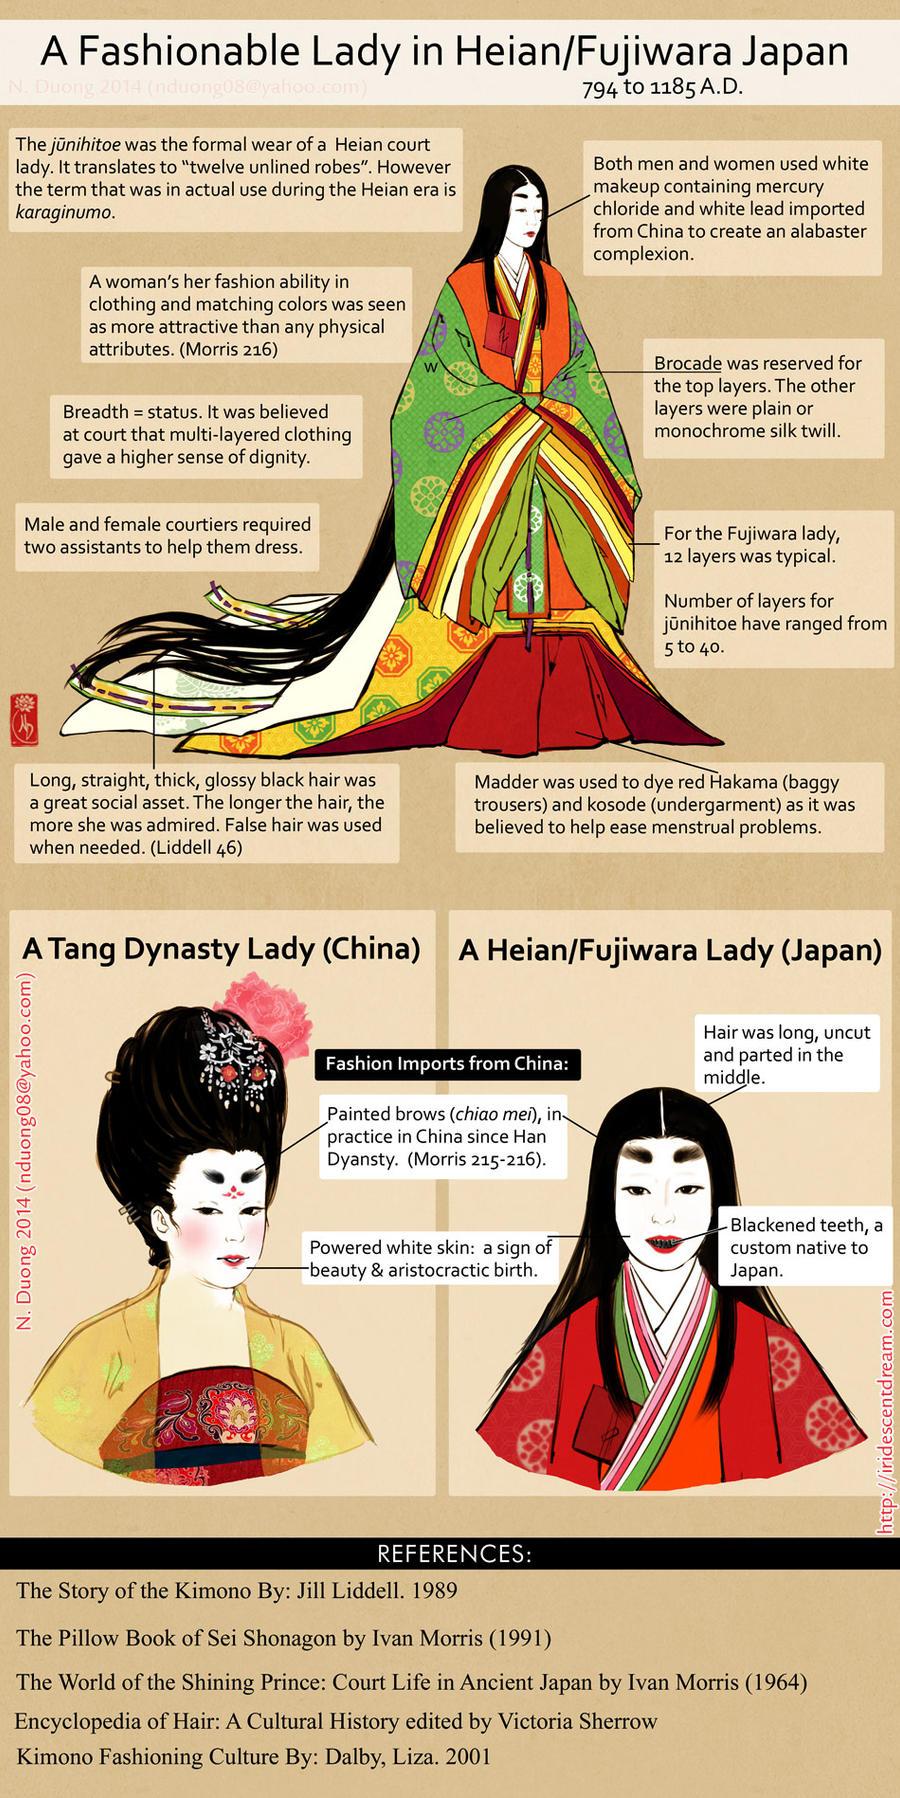 Fashionable Lady of Heian/Fujiwara Japan